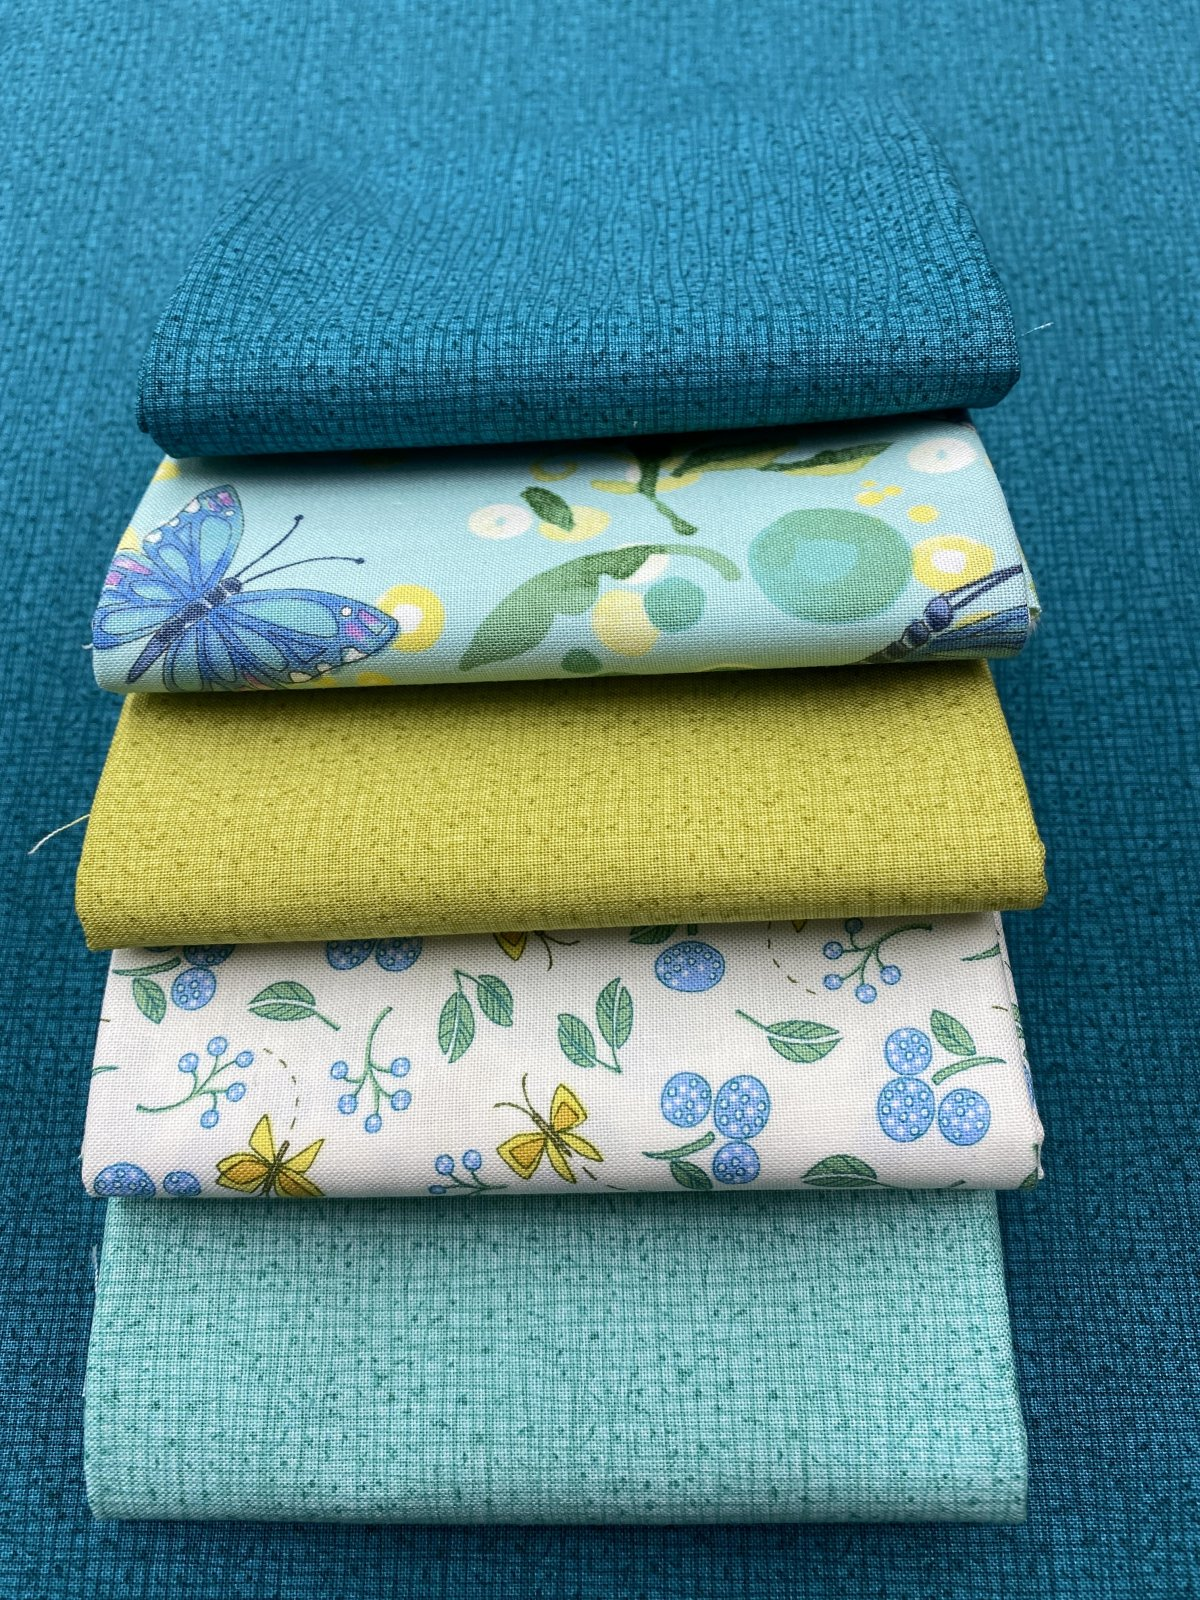 Cottage Bleu Fat Quarter Bundle (5Pc) by Robin Pickens for Moda